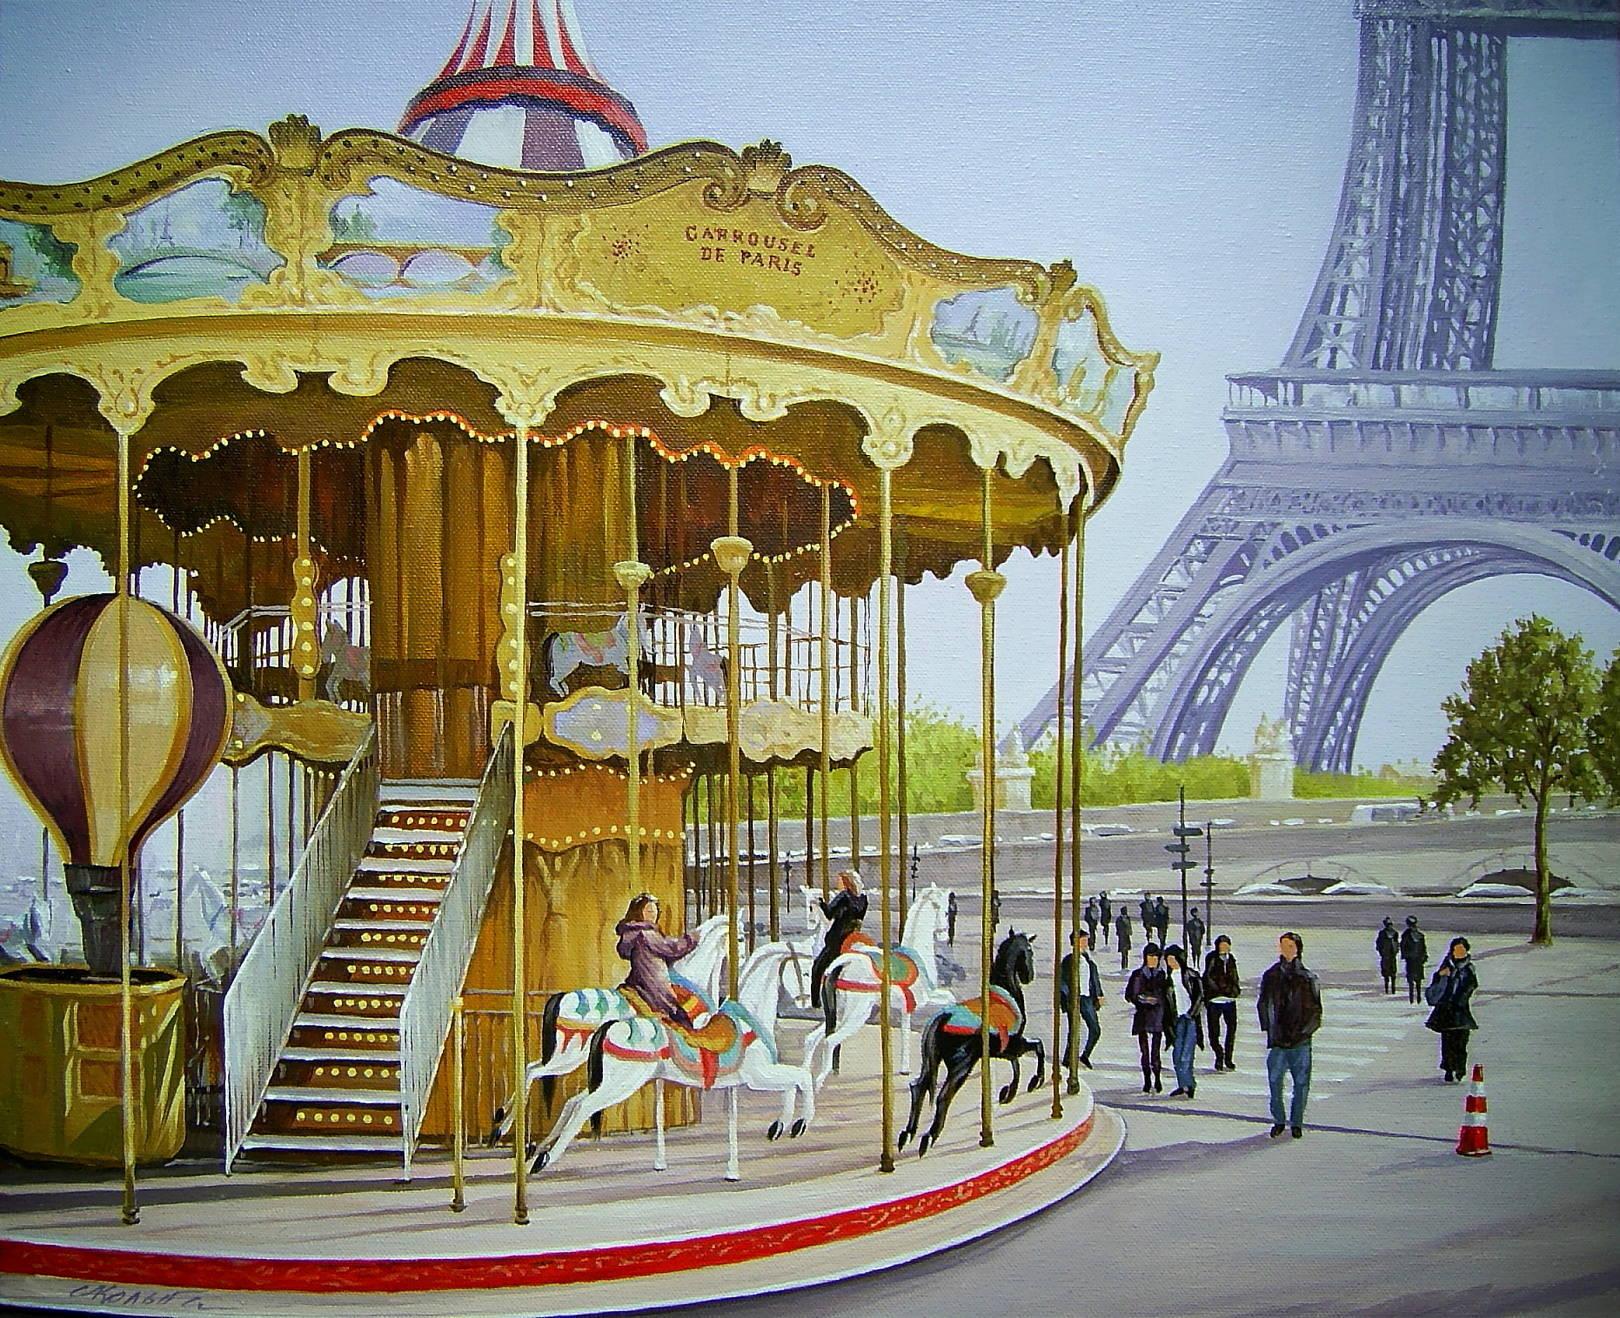 Carrousel de Paris. 50 х 60 см, холст, масло, 2018